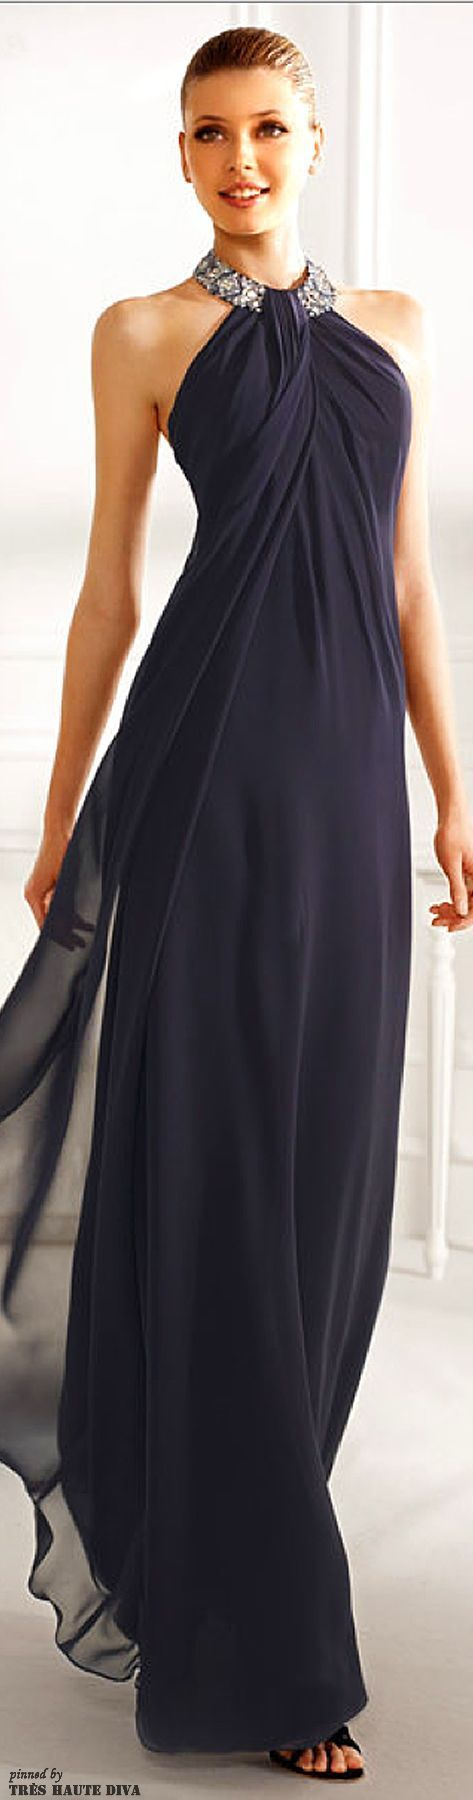 Black dress for prom night - Goodliness Prom Handmade Dresses Long 2016 Unique Prom Night Dress 2017